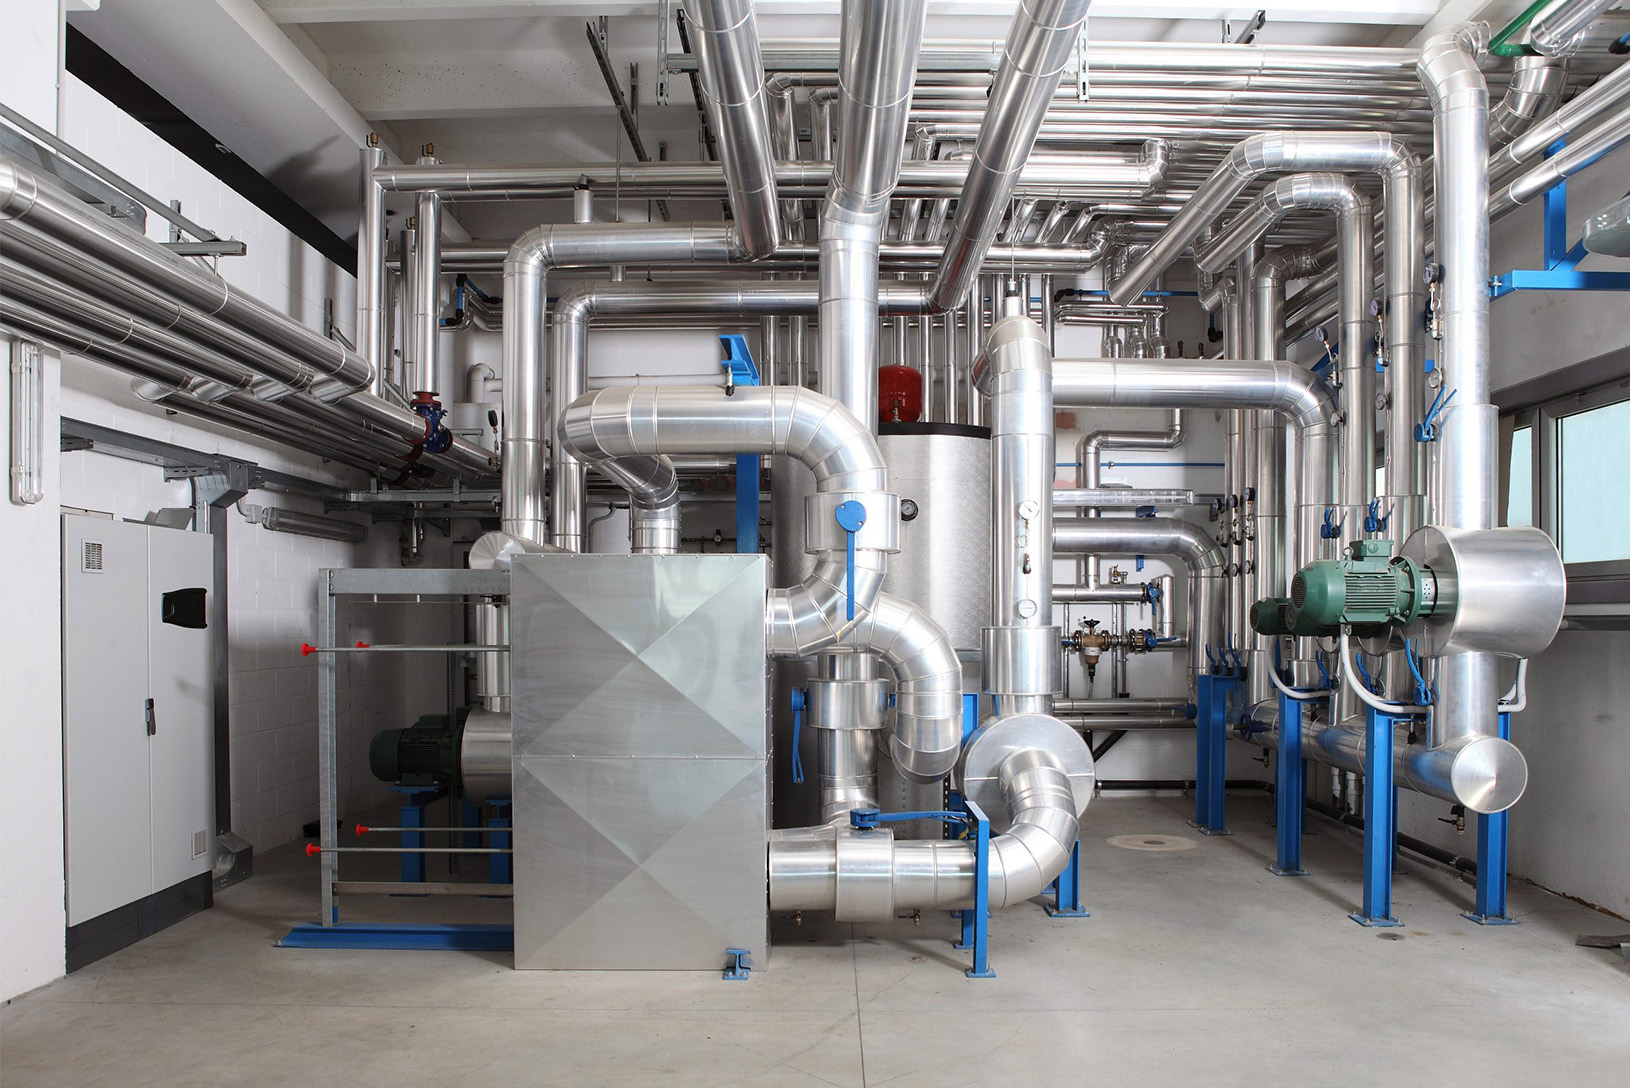 nottingham industrial air conditioning